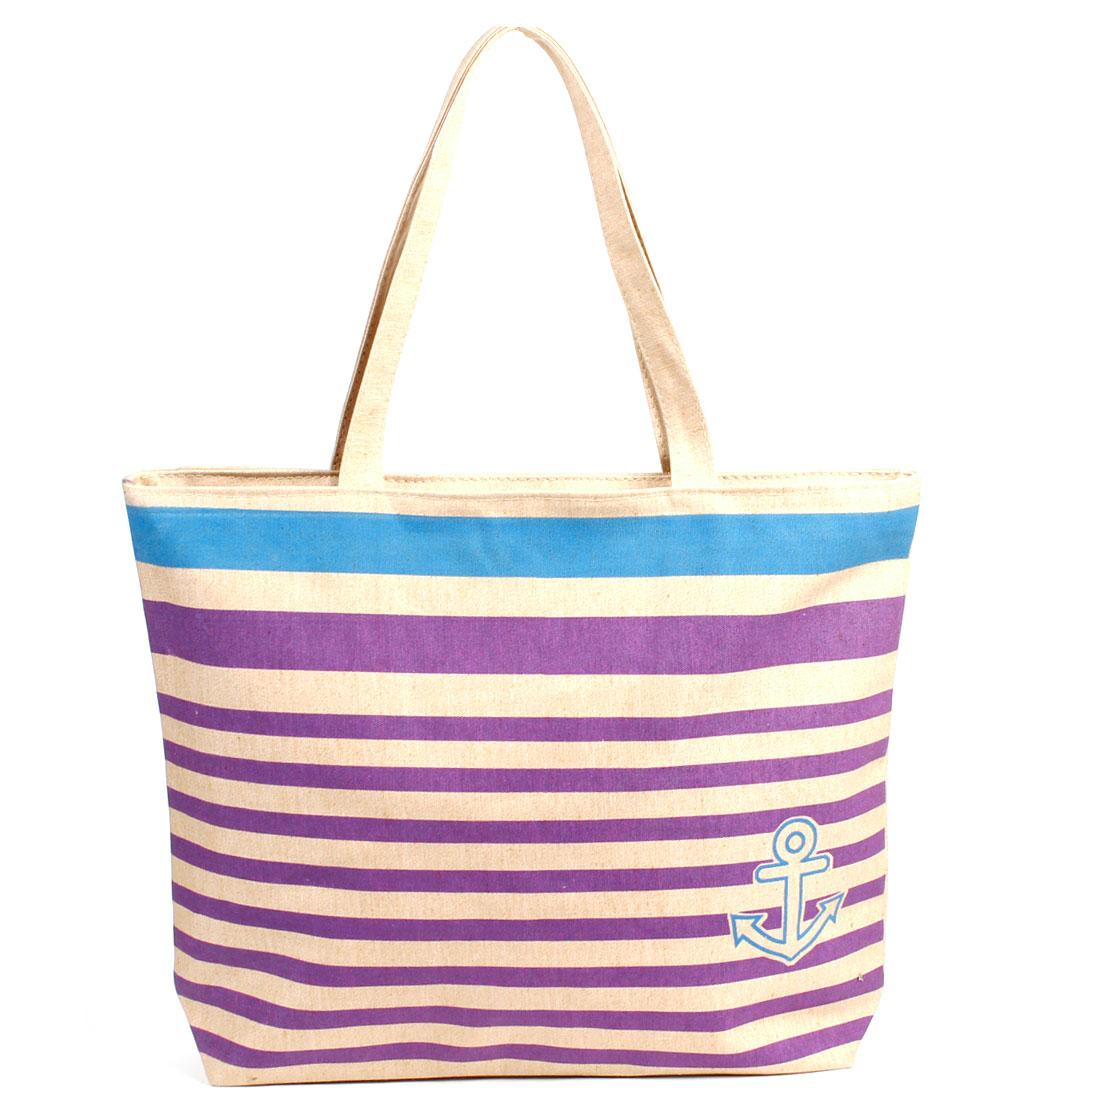 Lady Horizonal Strip Print Nylon Lining Zip Up Handbag Bag Apricot Color Purple